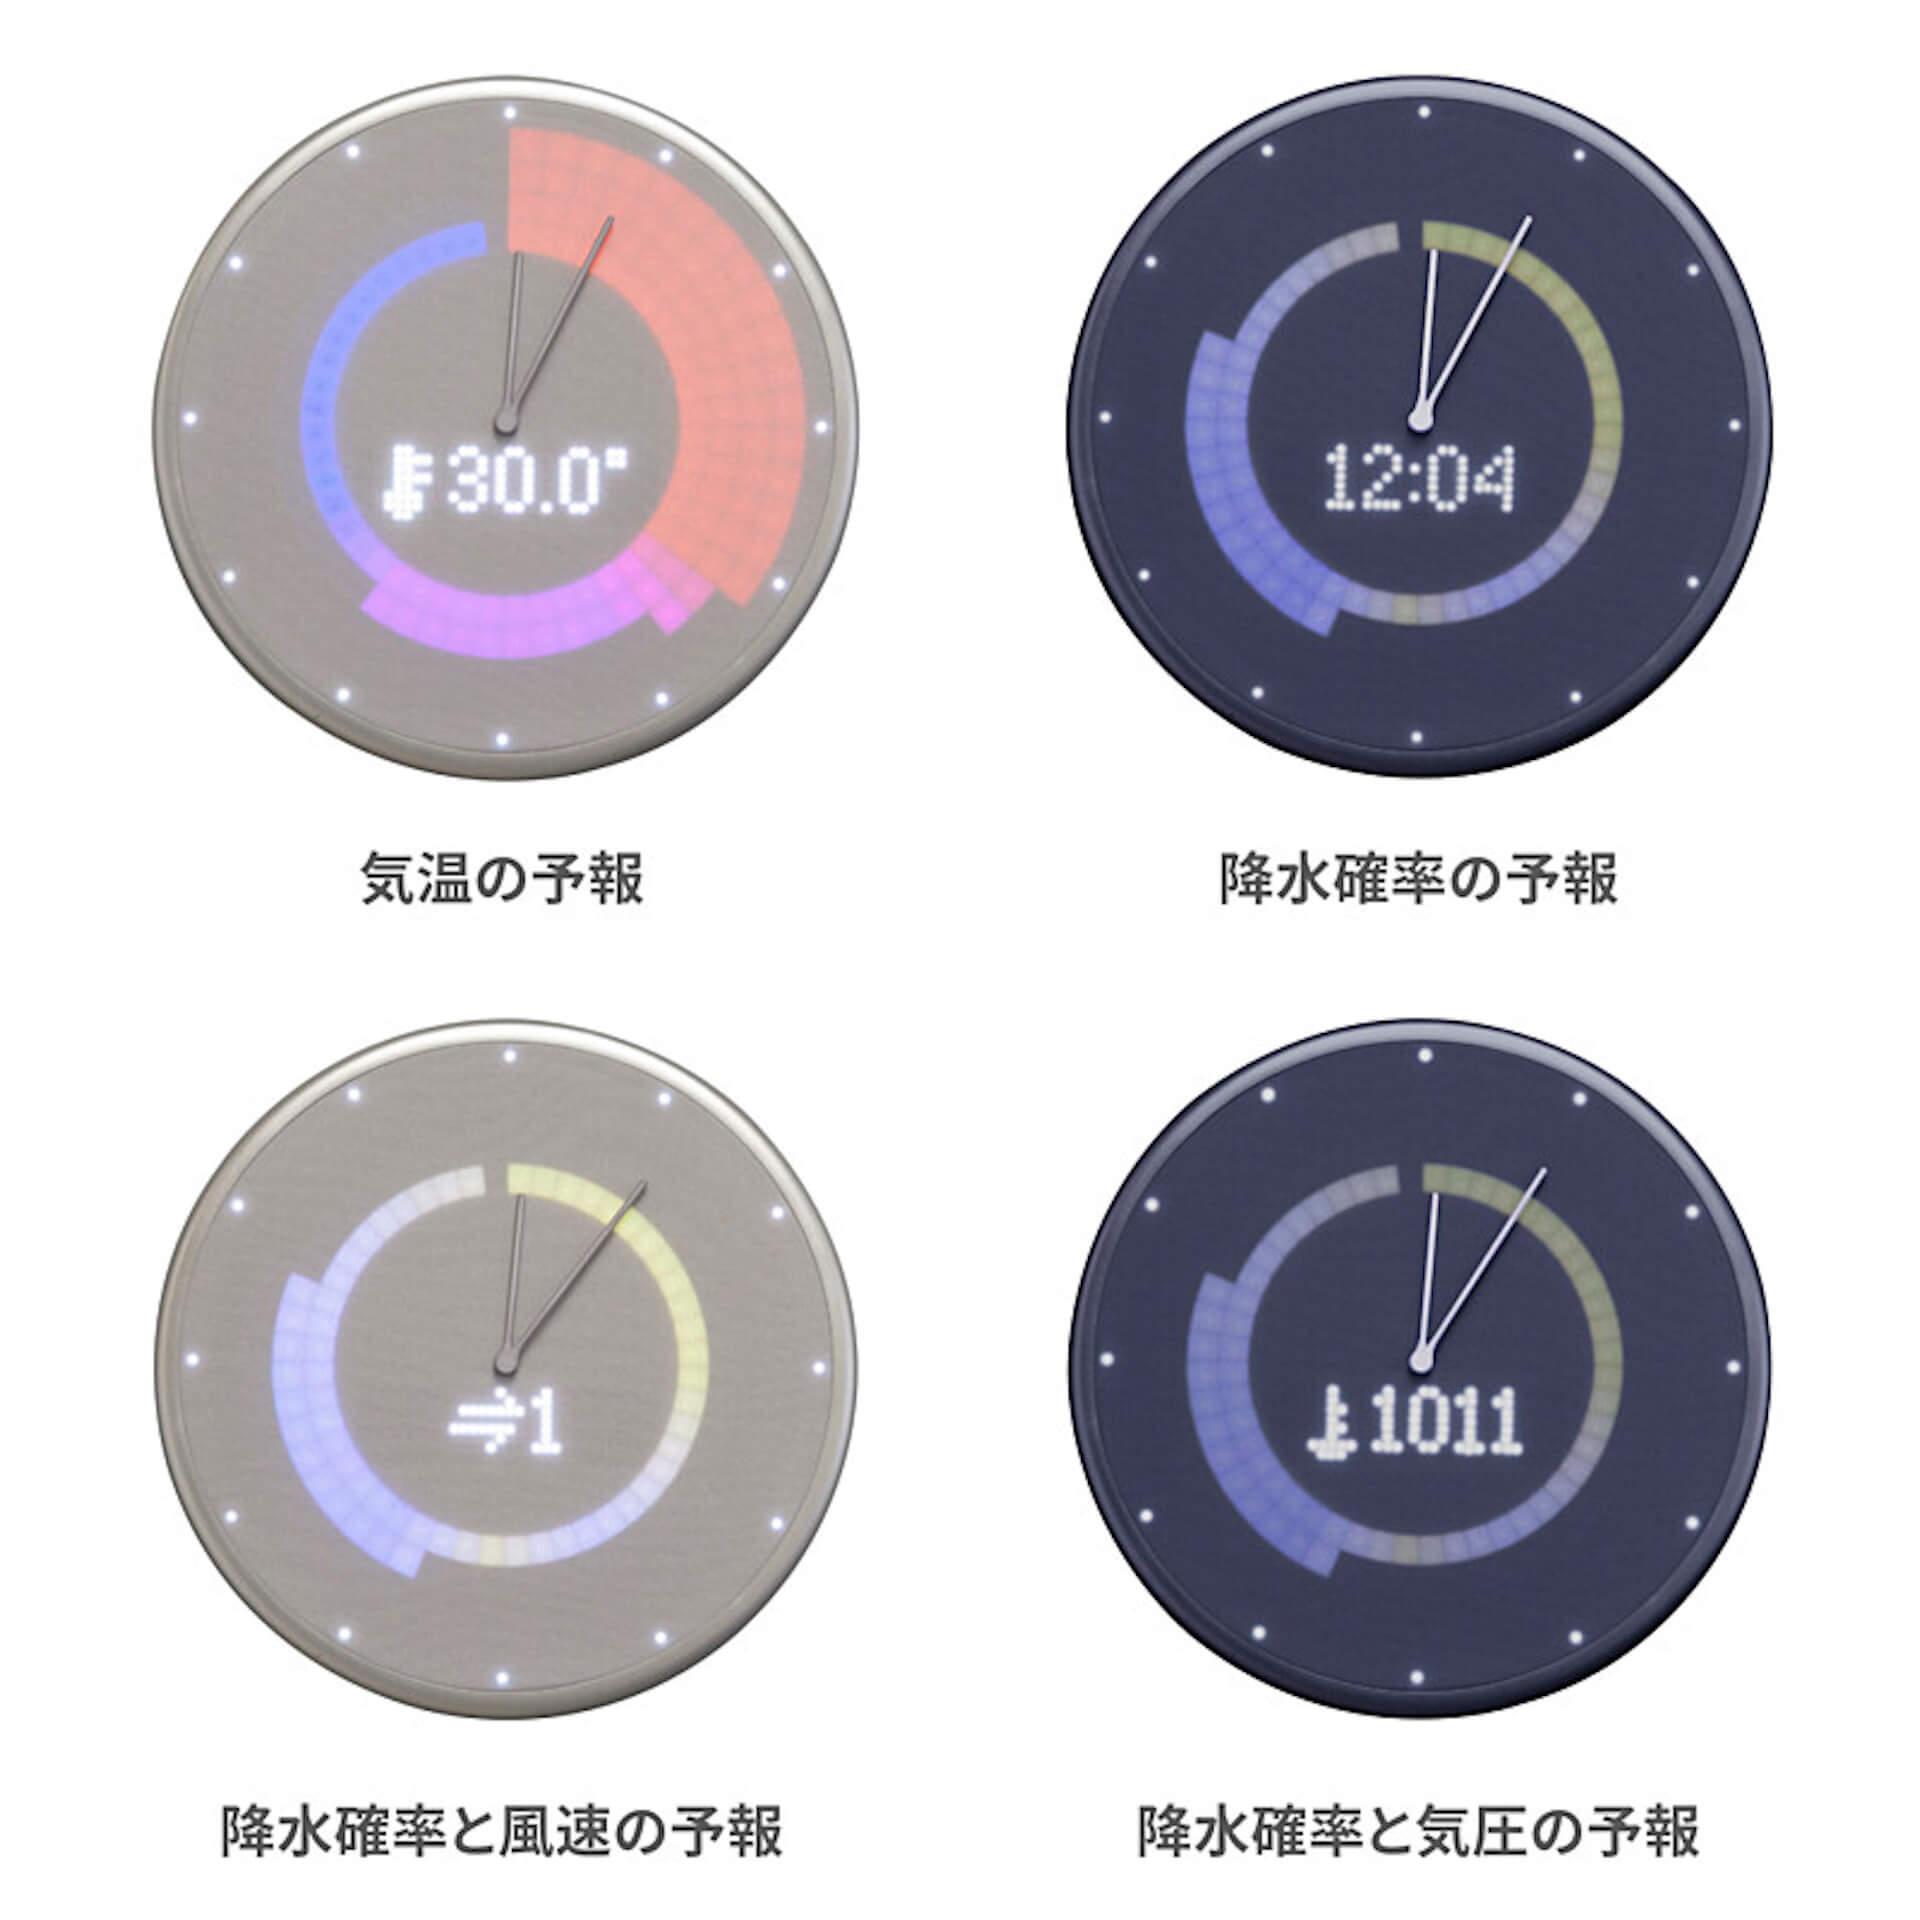 Google・Apple同期でスケジュール管理|忙しい日常をサポートするIoT掛け時計「Glance Clock」が登場 tech190904glanceclock_7